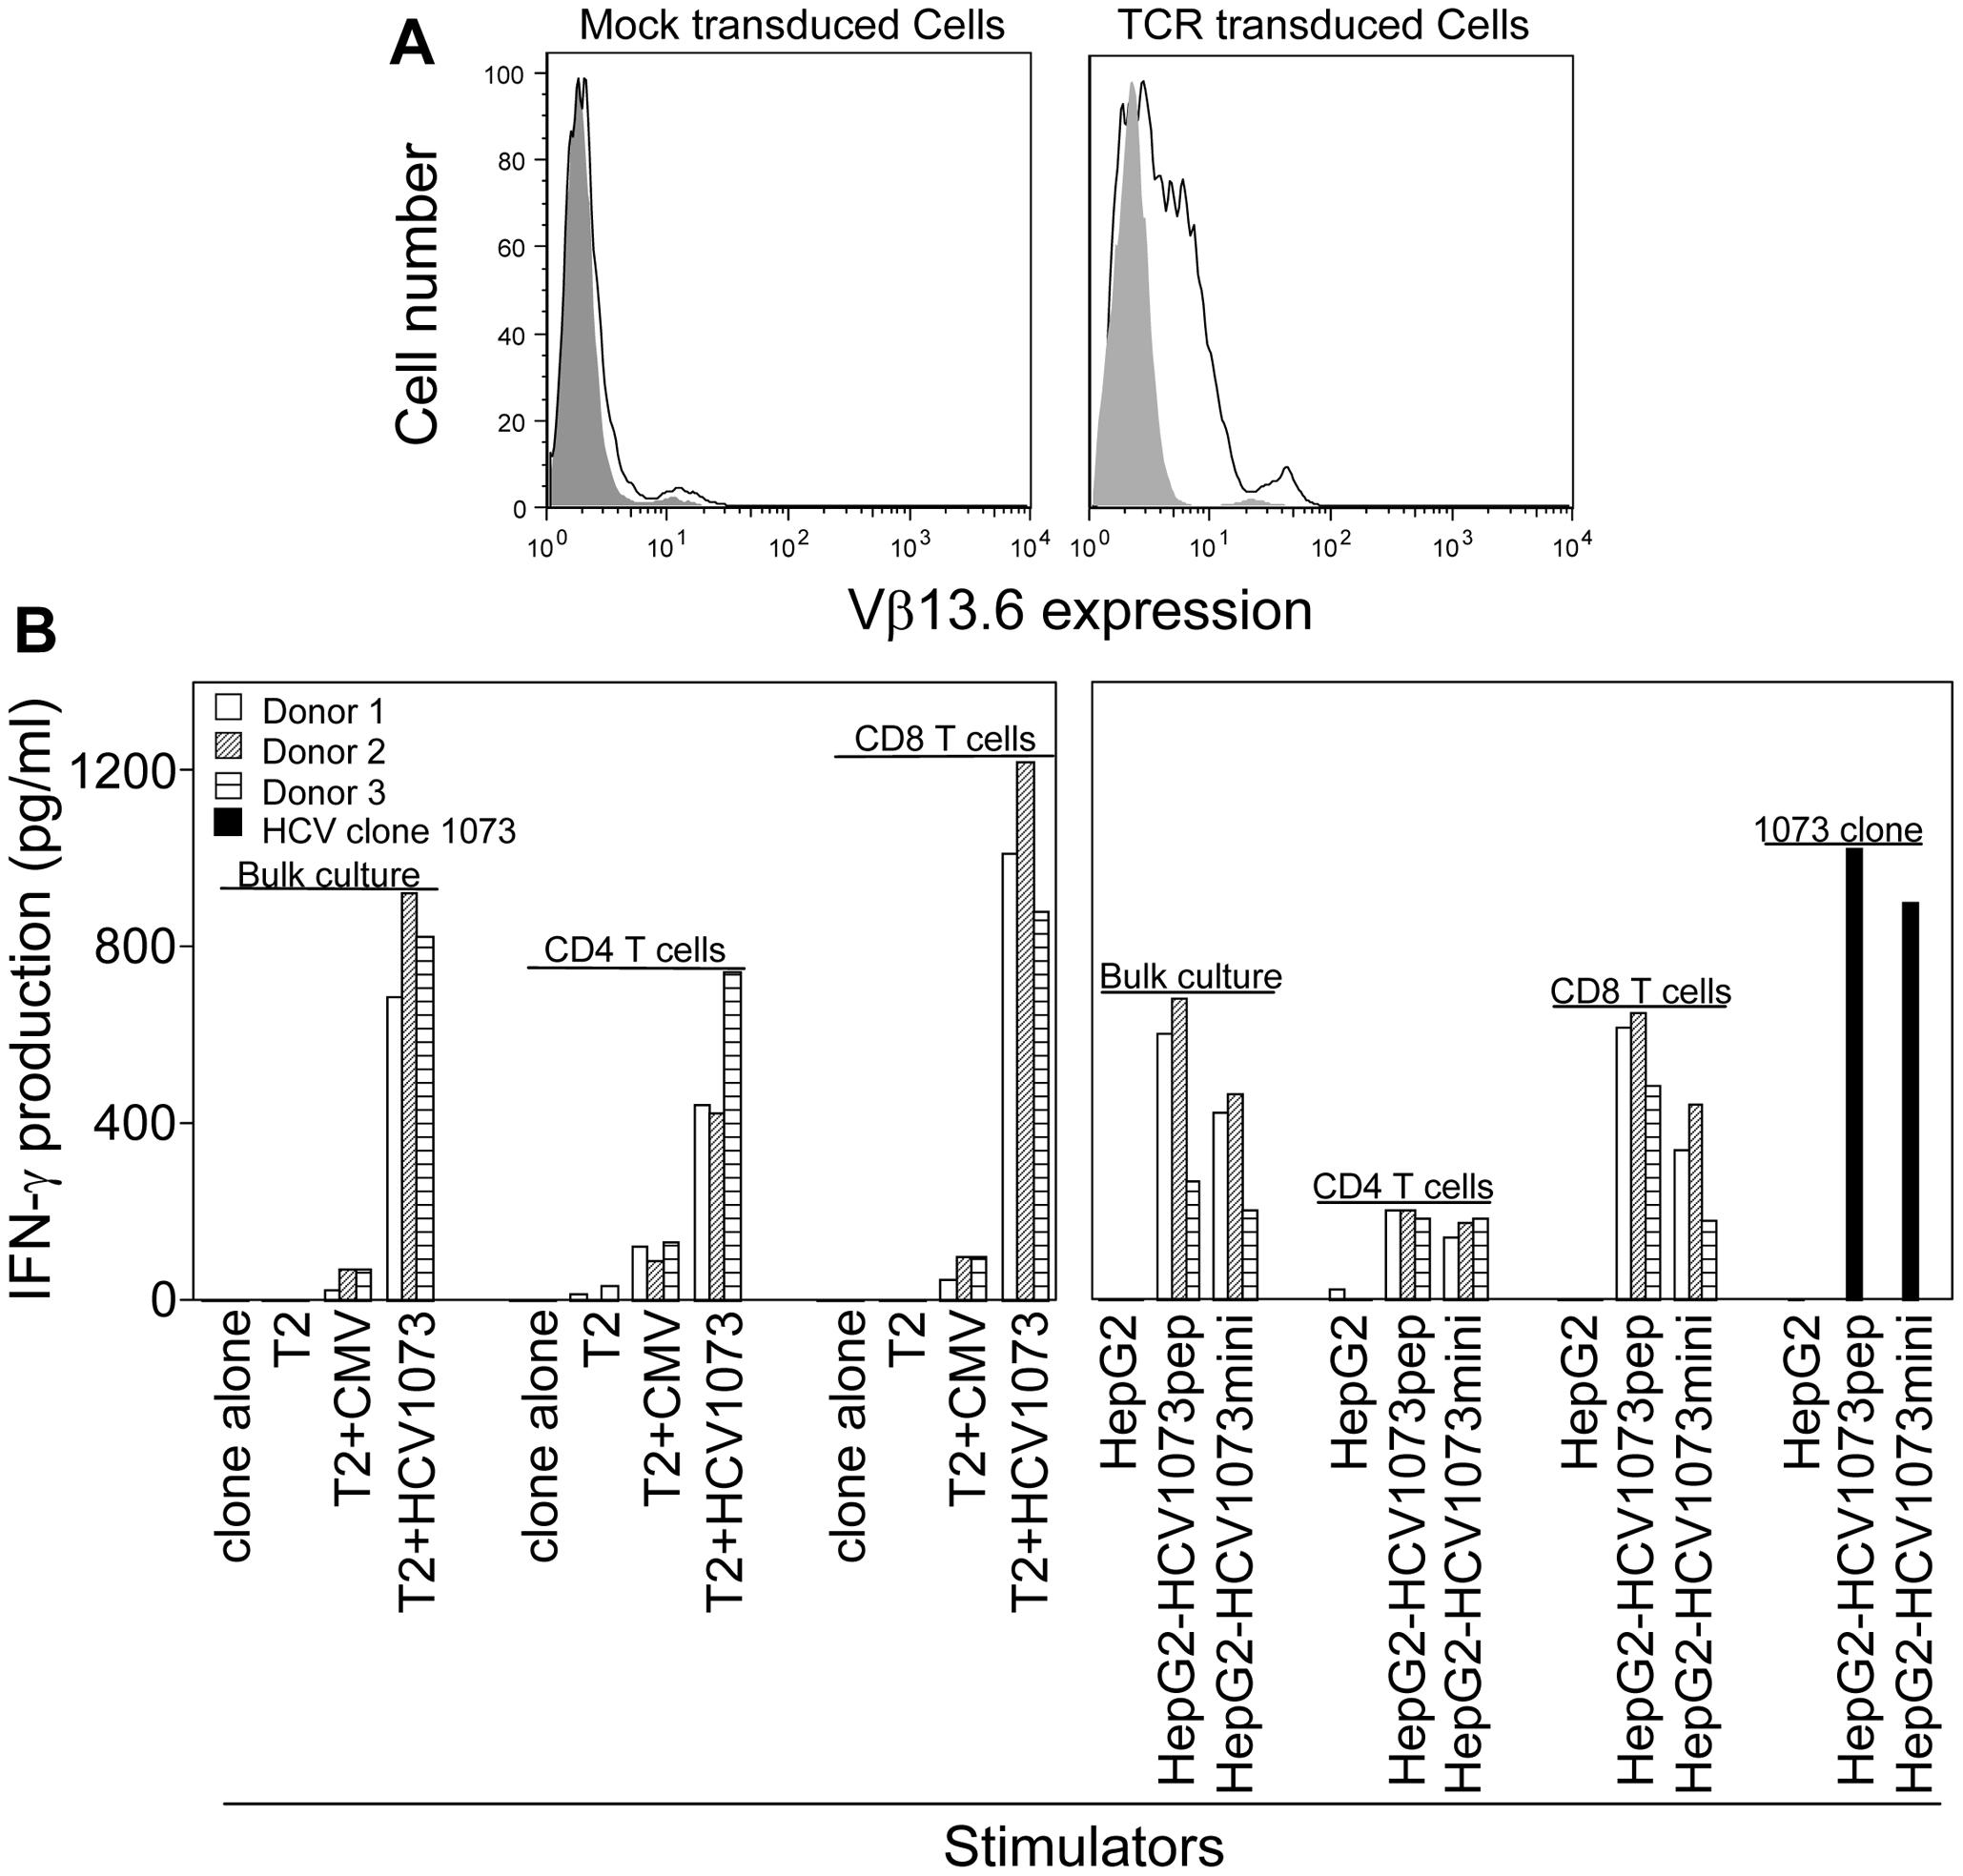 Antigen recognition by HCV TCR 1073-transduced PBLs.